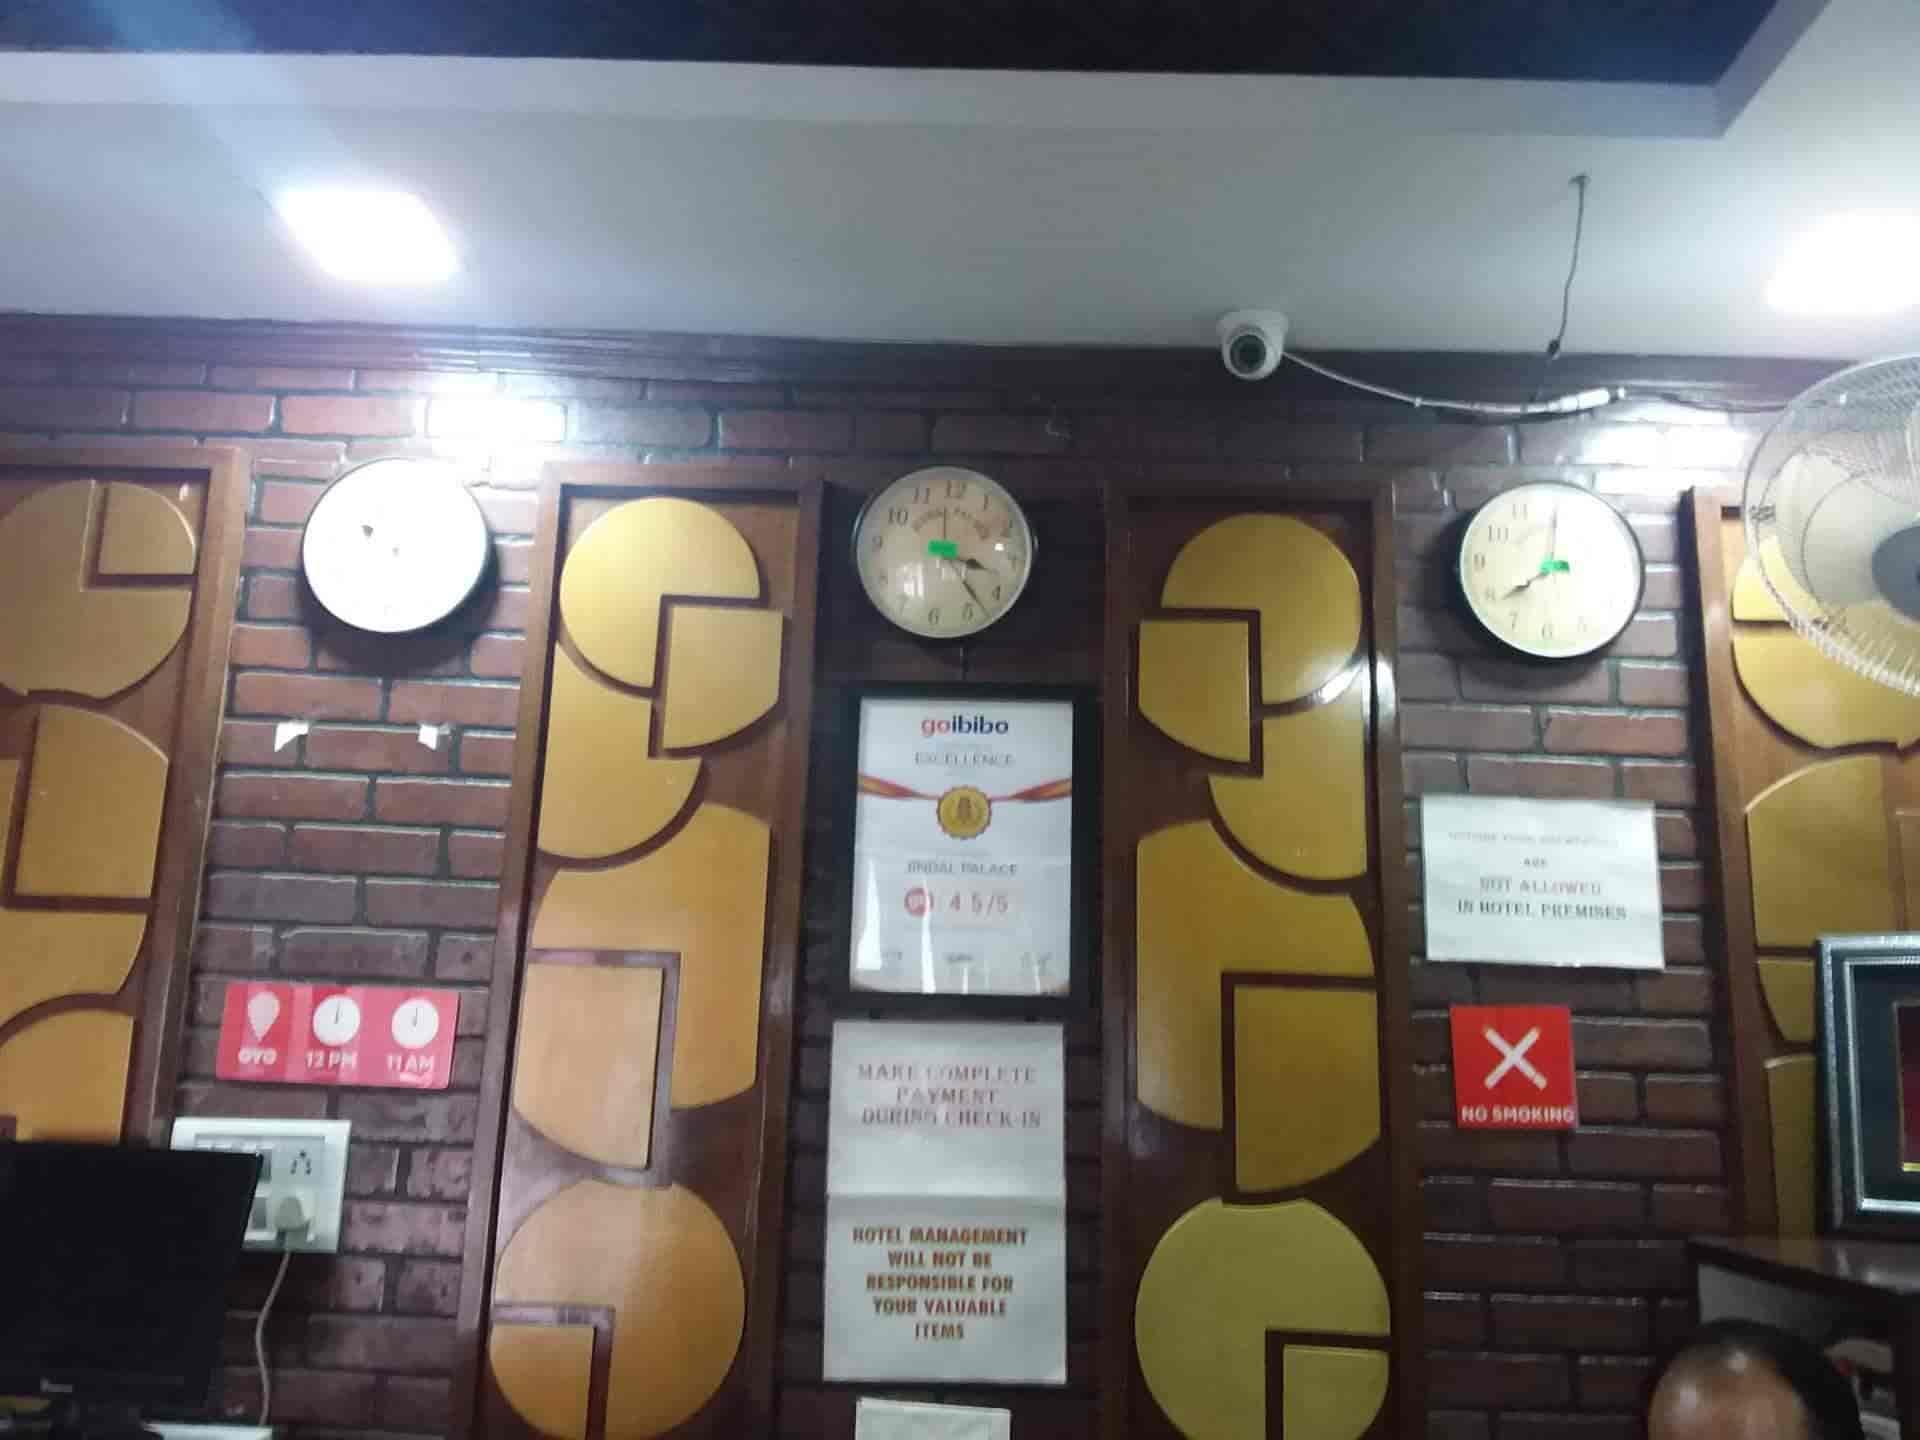 Hotel Jindal Palace, Mahipalpur - 3 Star Hotels in Delhi - Justdial